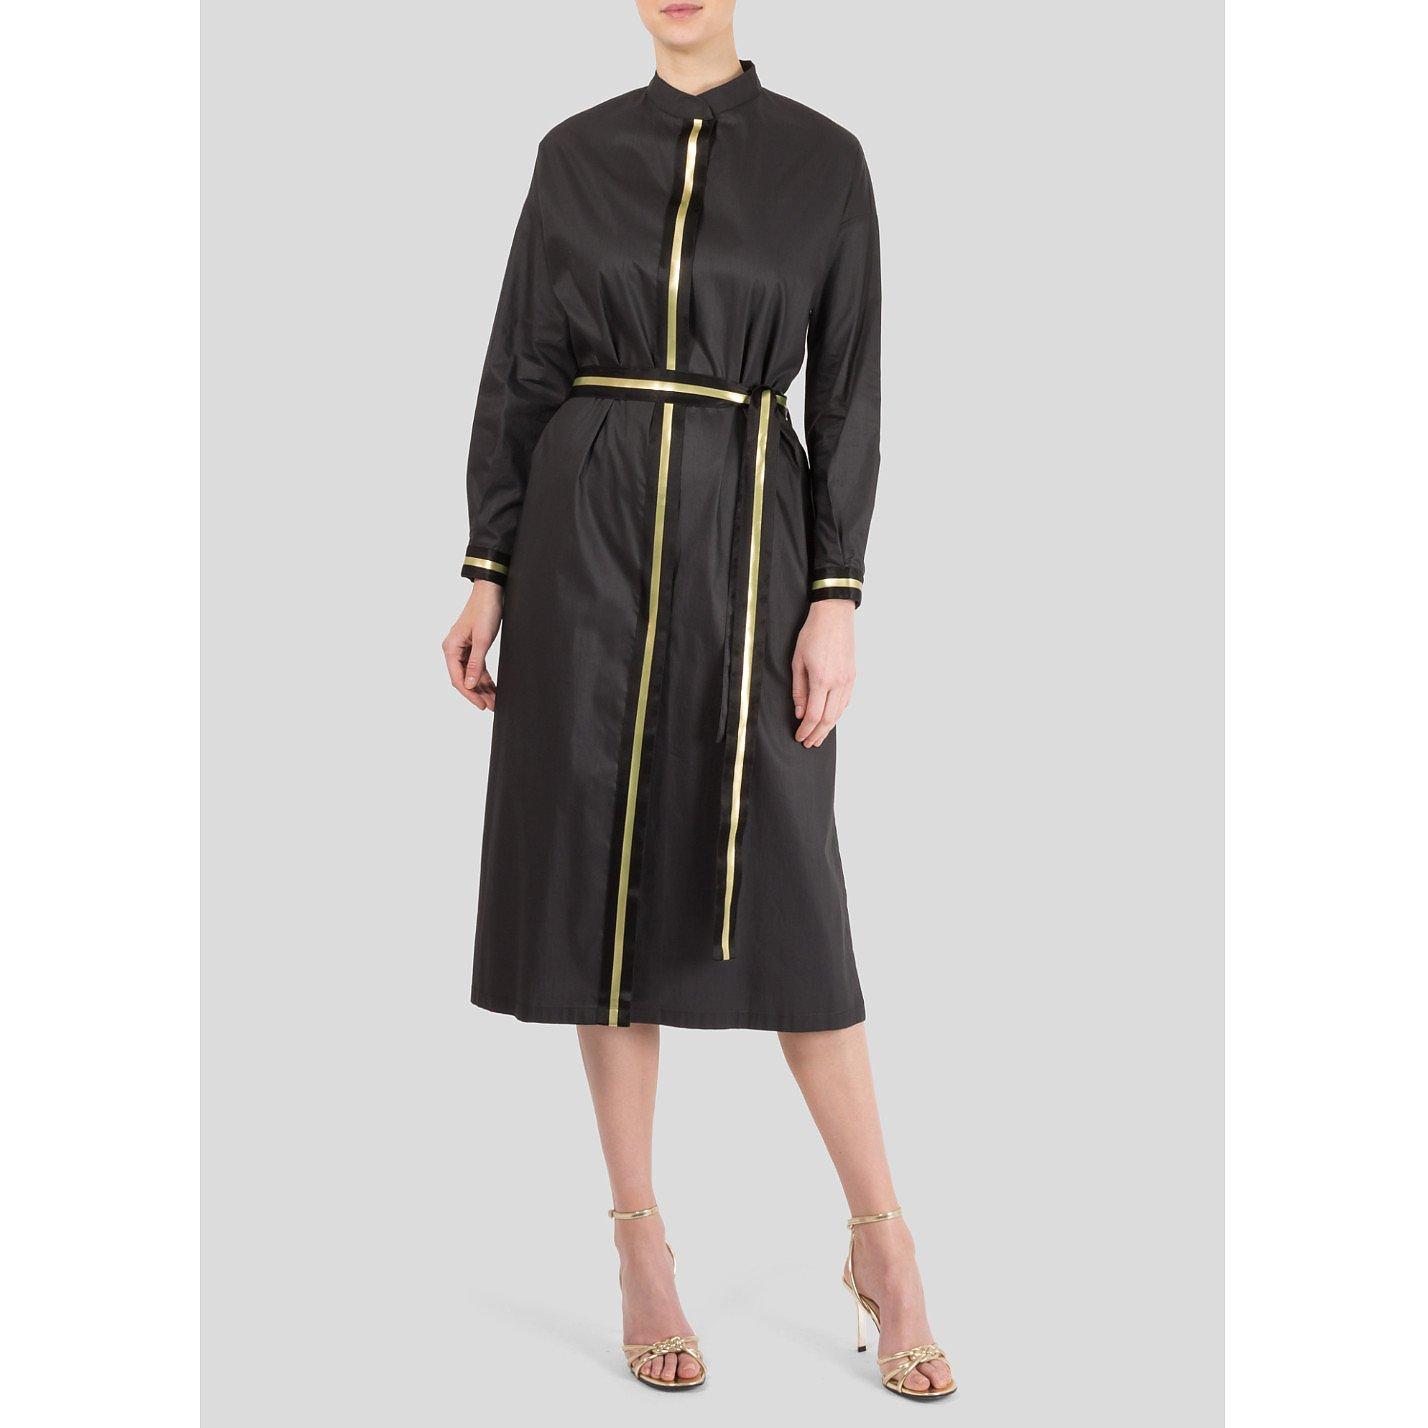 Ereda High Neck Stripe Detail Dress